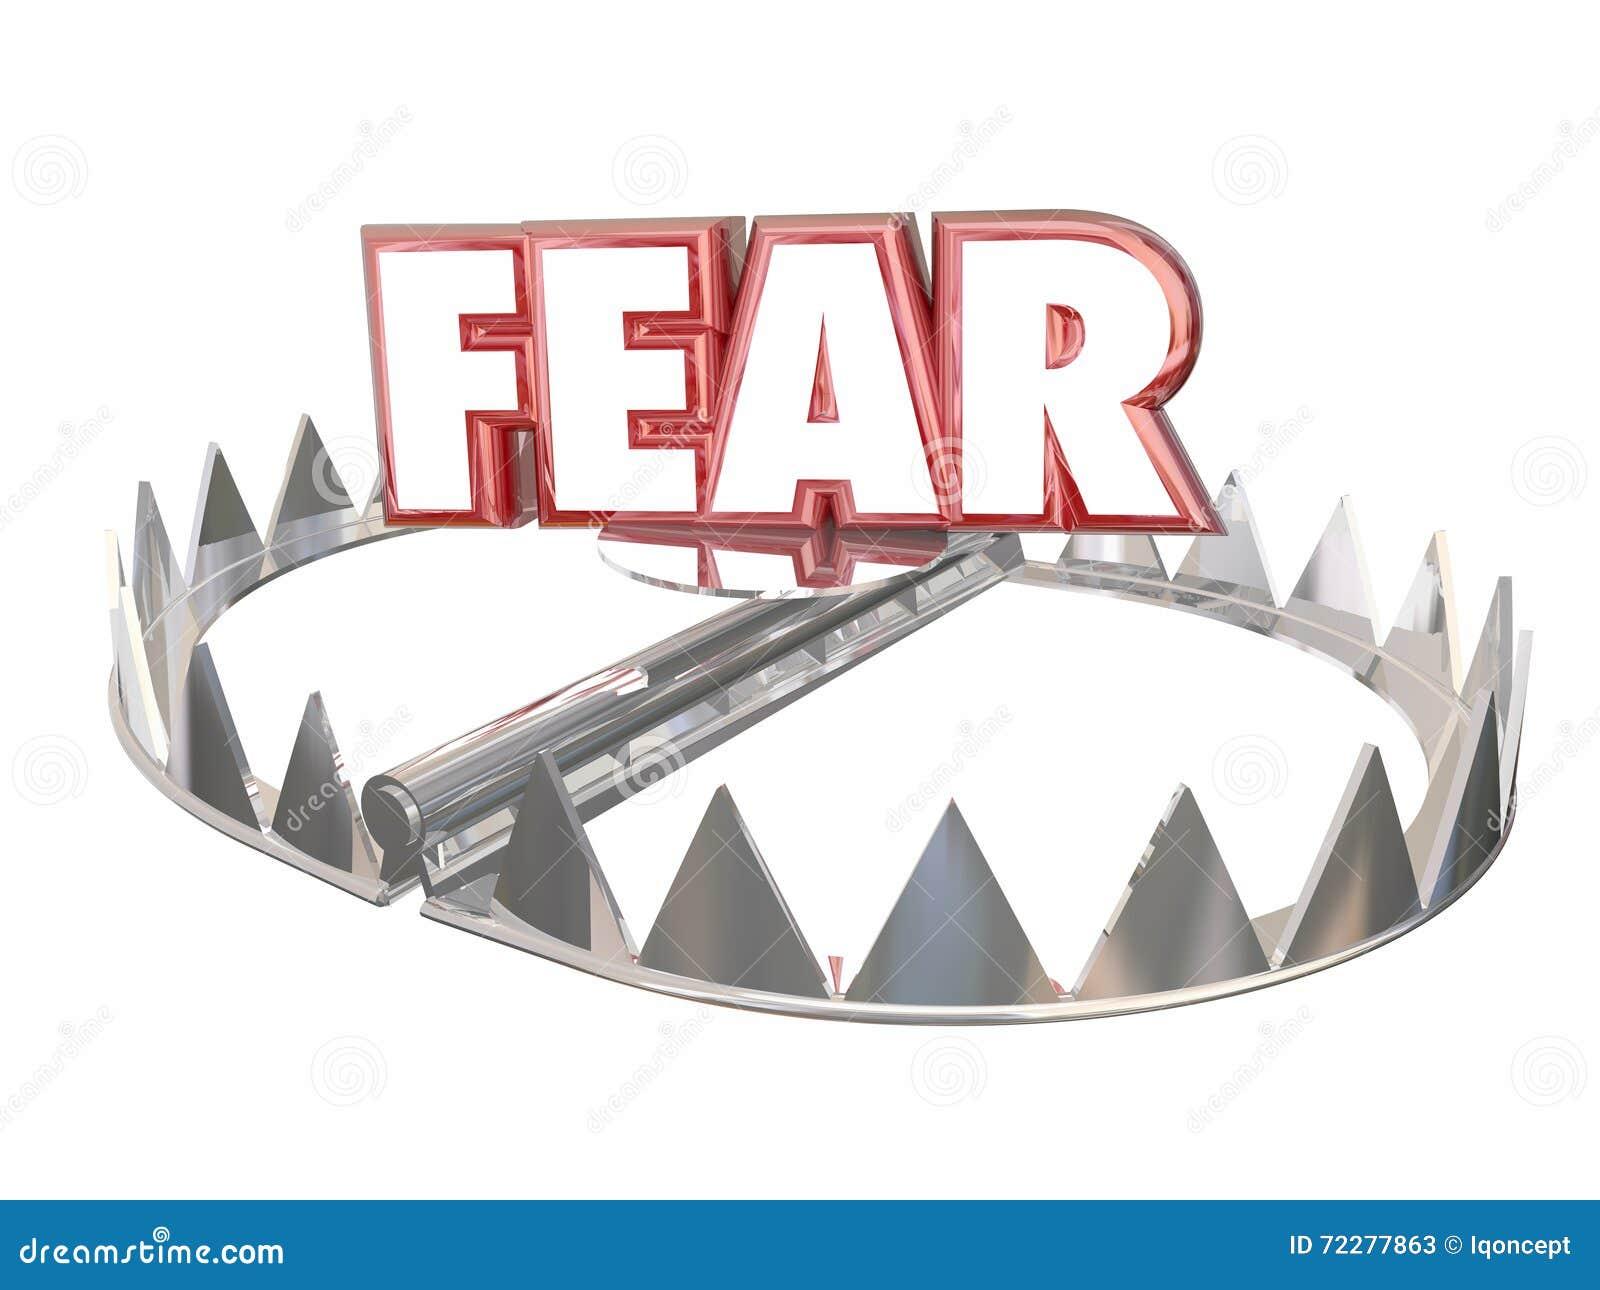 Fear Afraid Danger Scared Warning Bear Trap Word